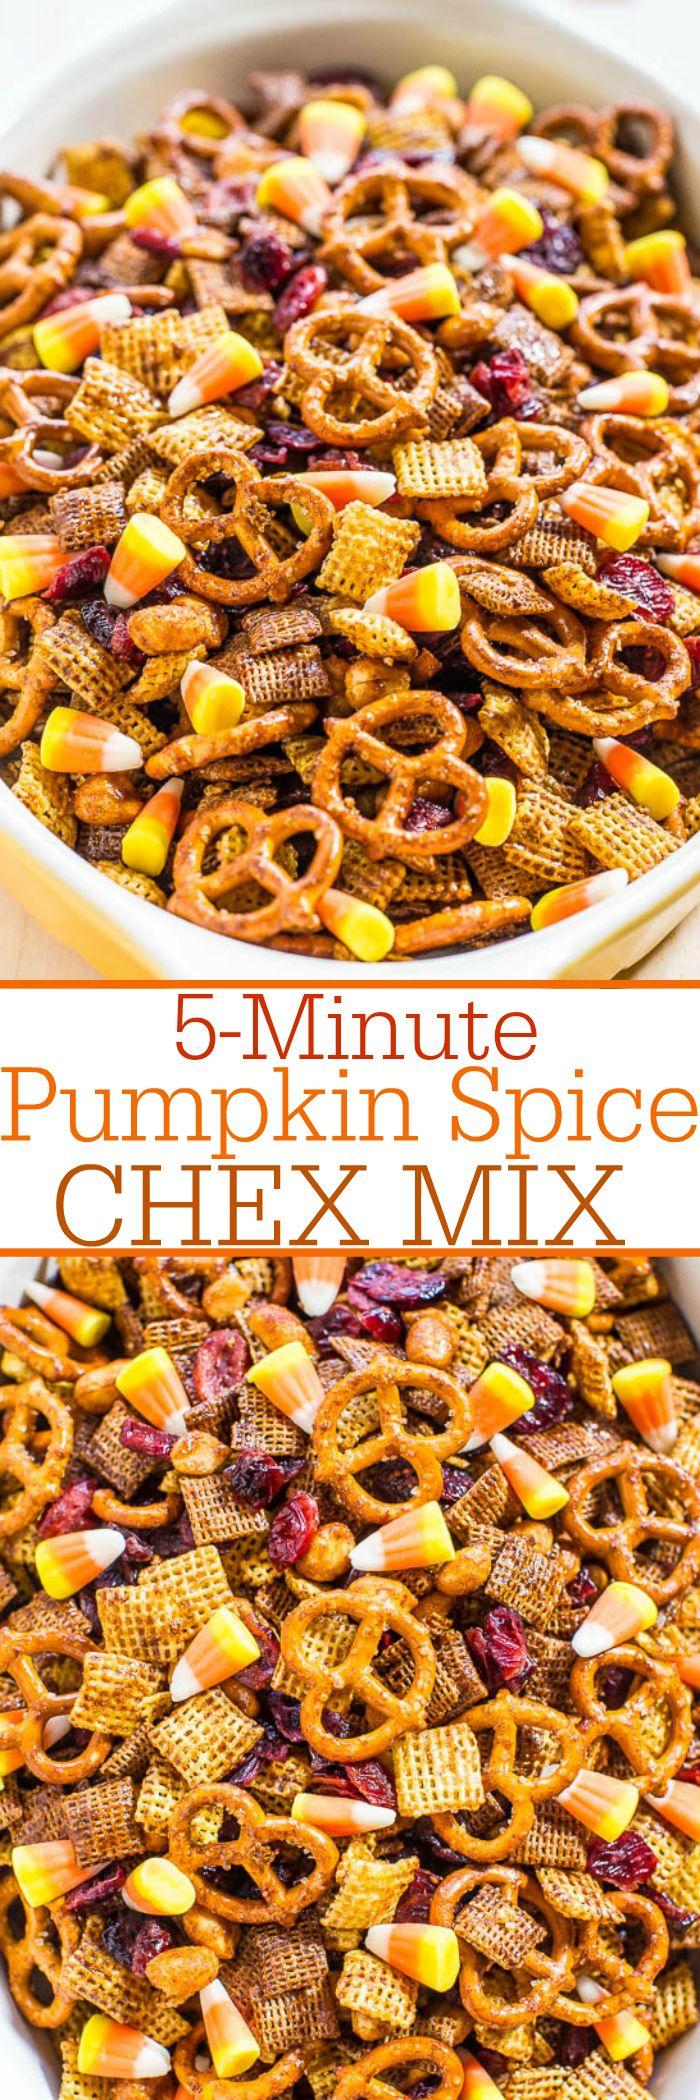 5-Minute Pumpkin Spice Chex Mix